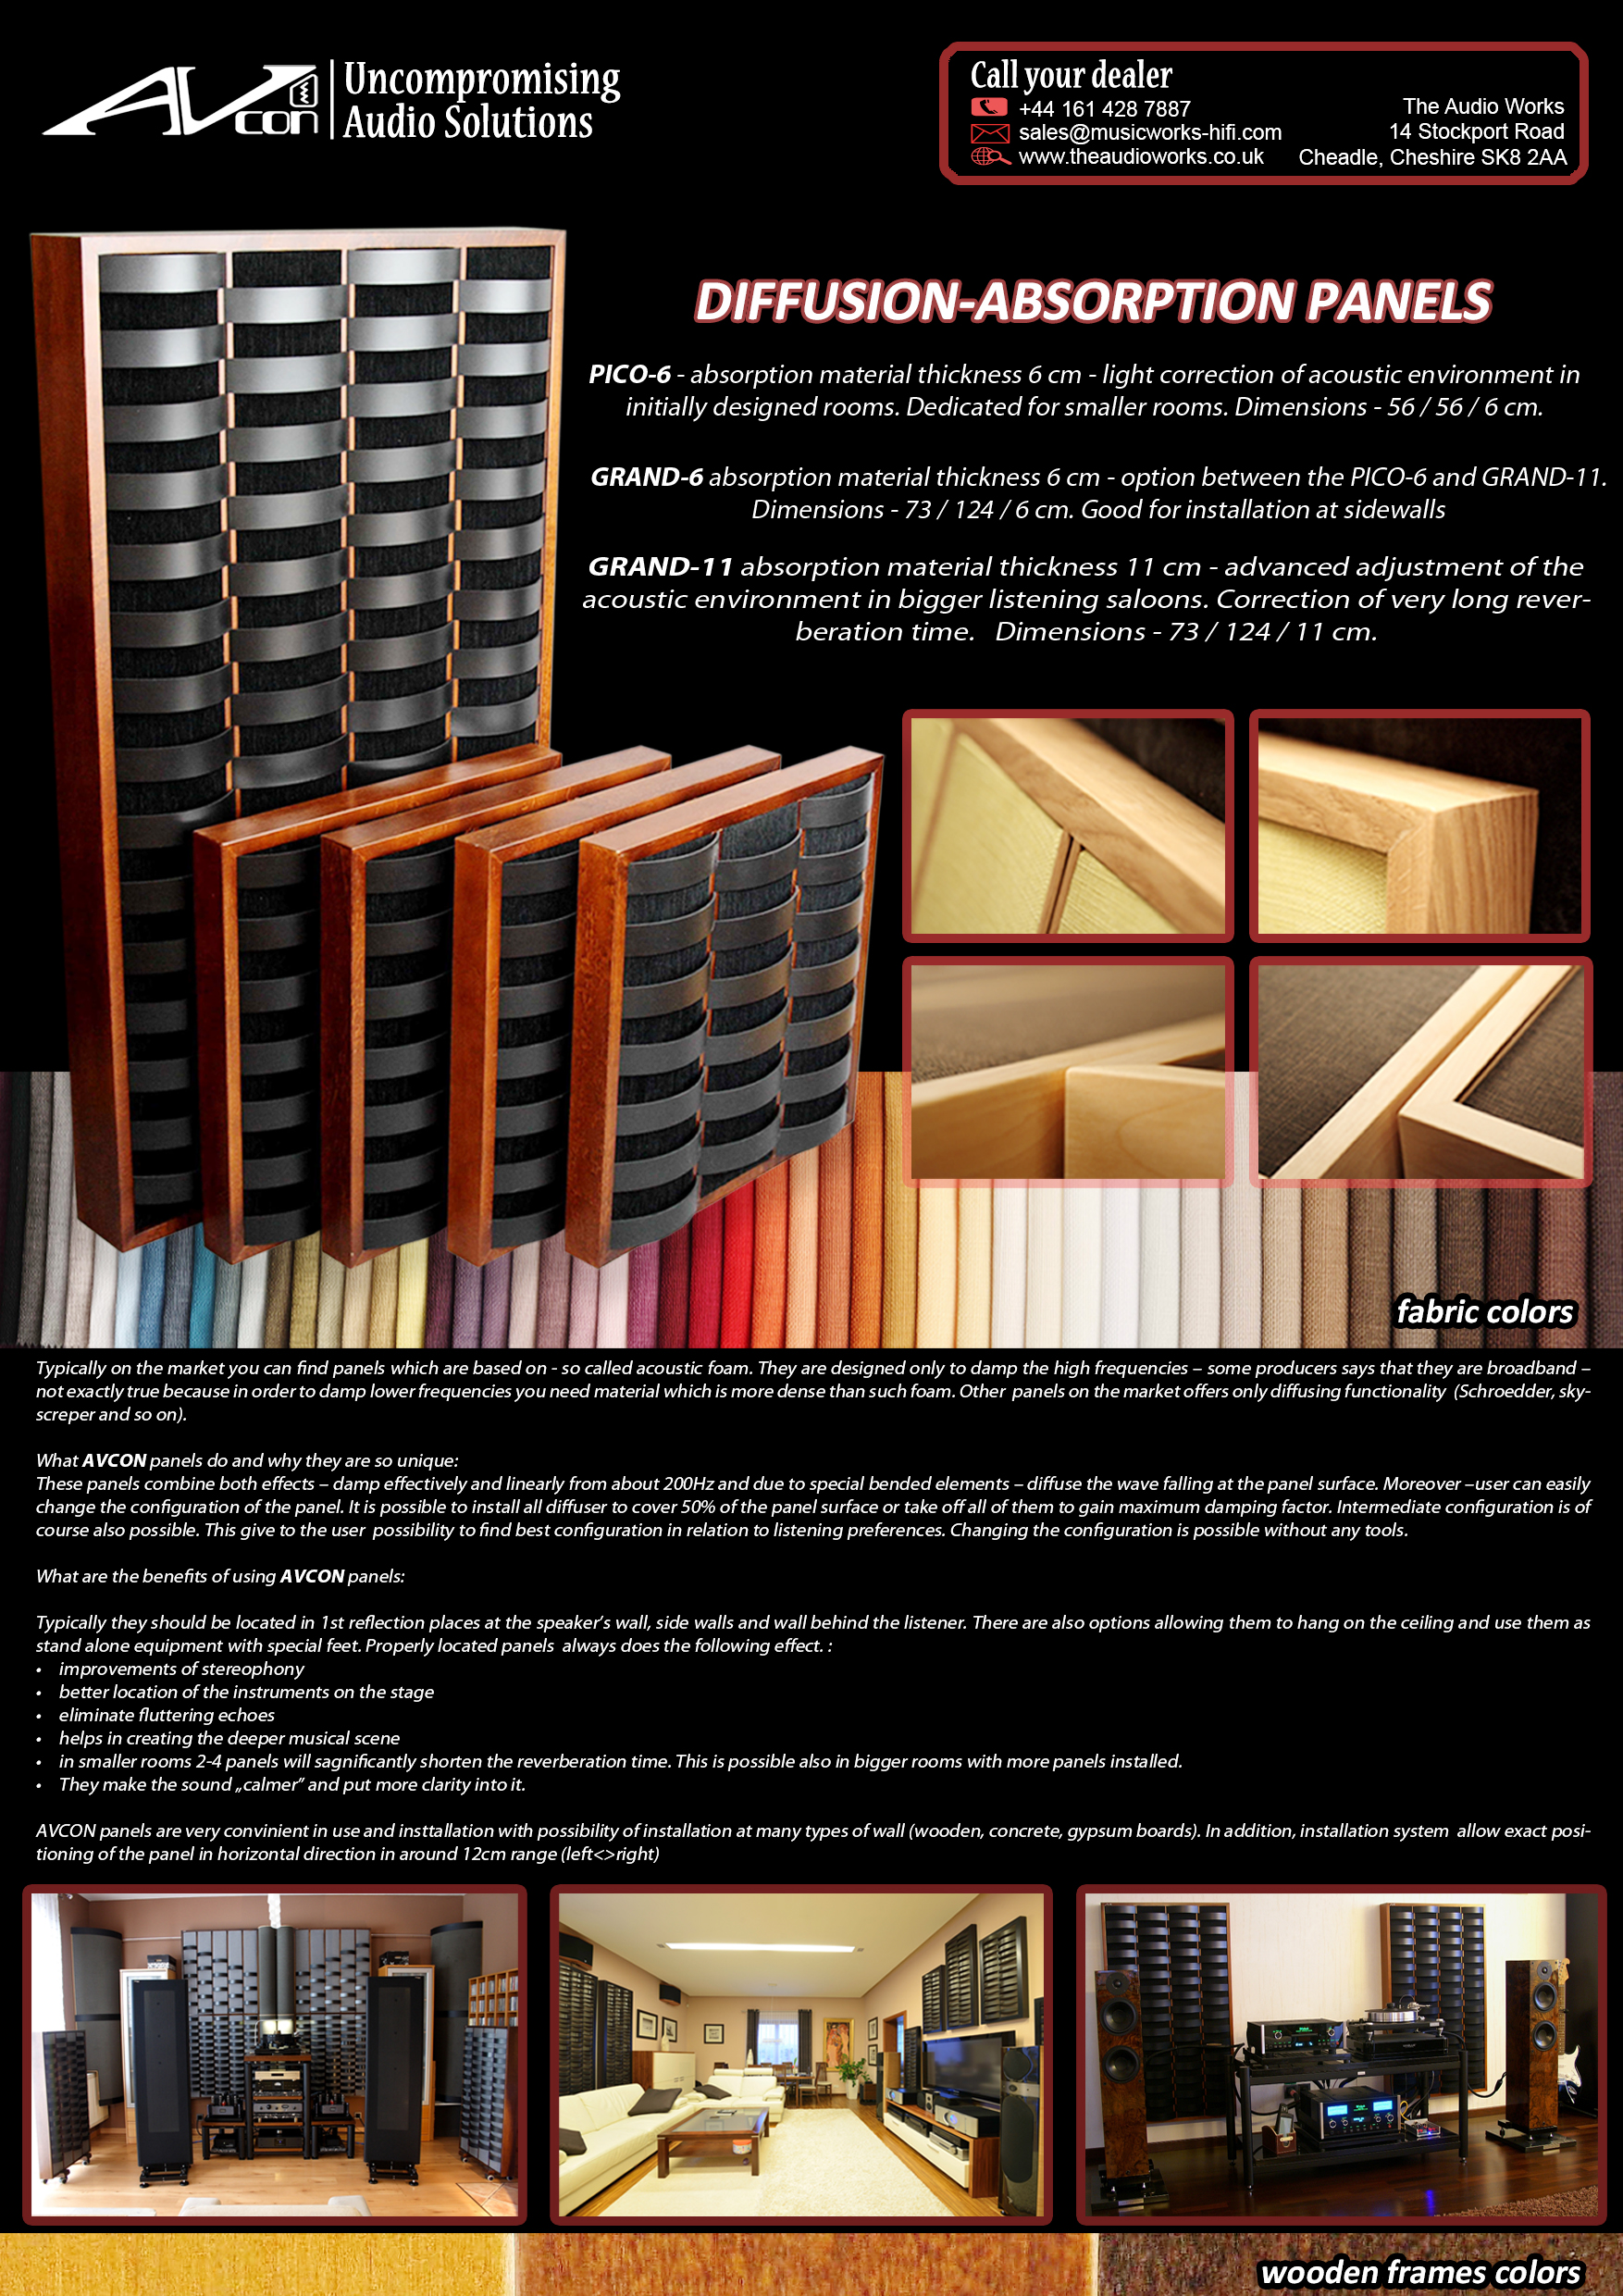 AVCON - acoustic panels - Audioworks - full pa ge 1 - czarne t³o - call dealer na czarnym